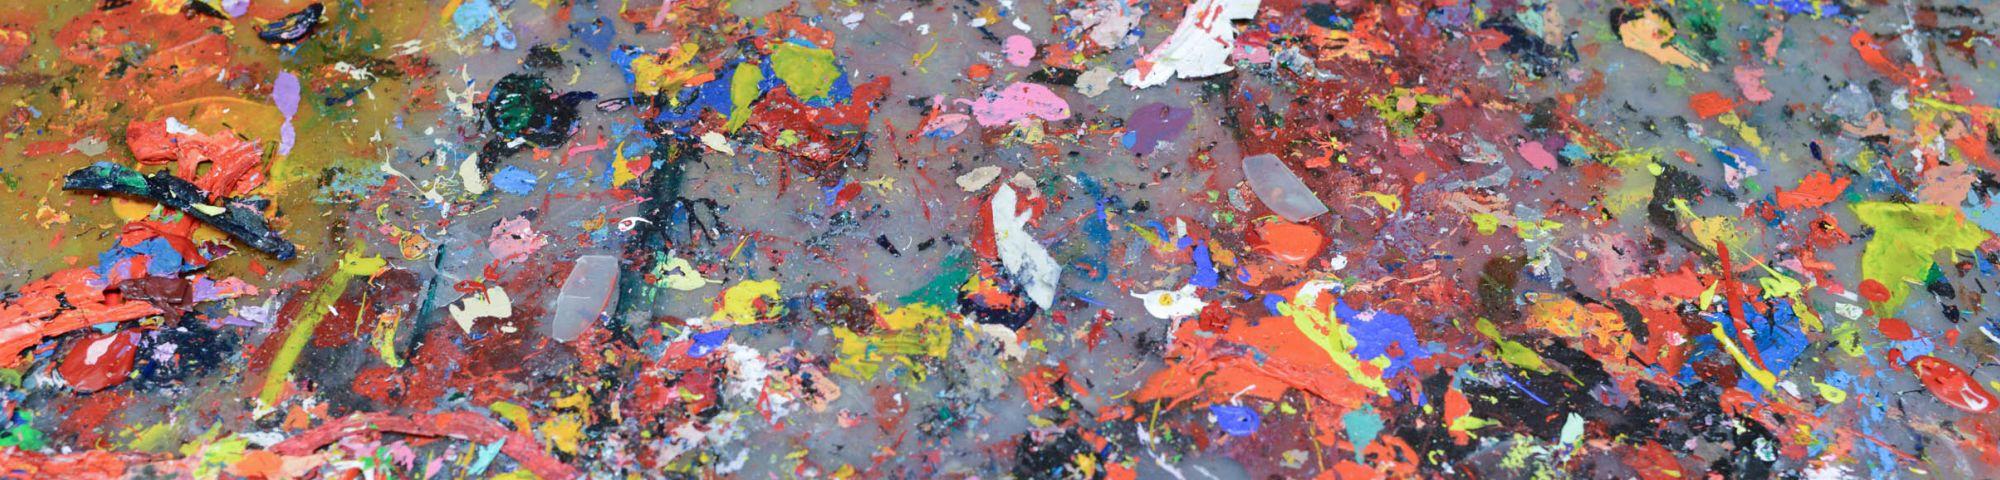 Close up shot of paint splodges